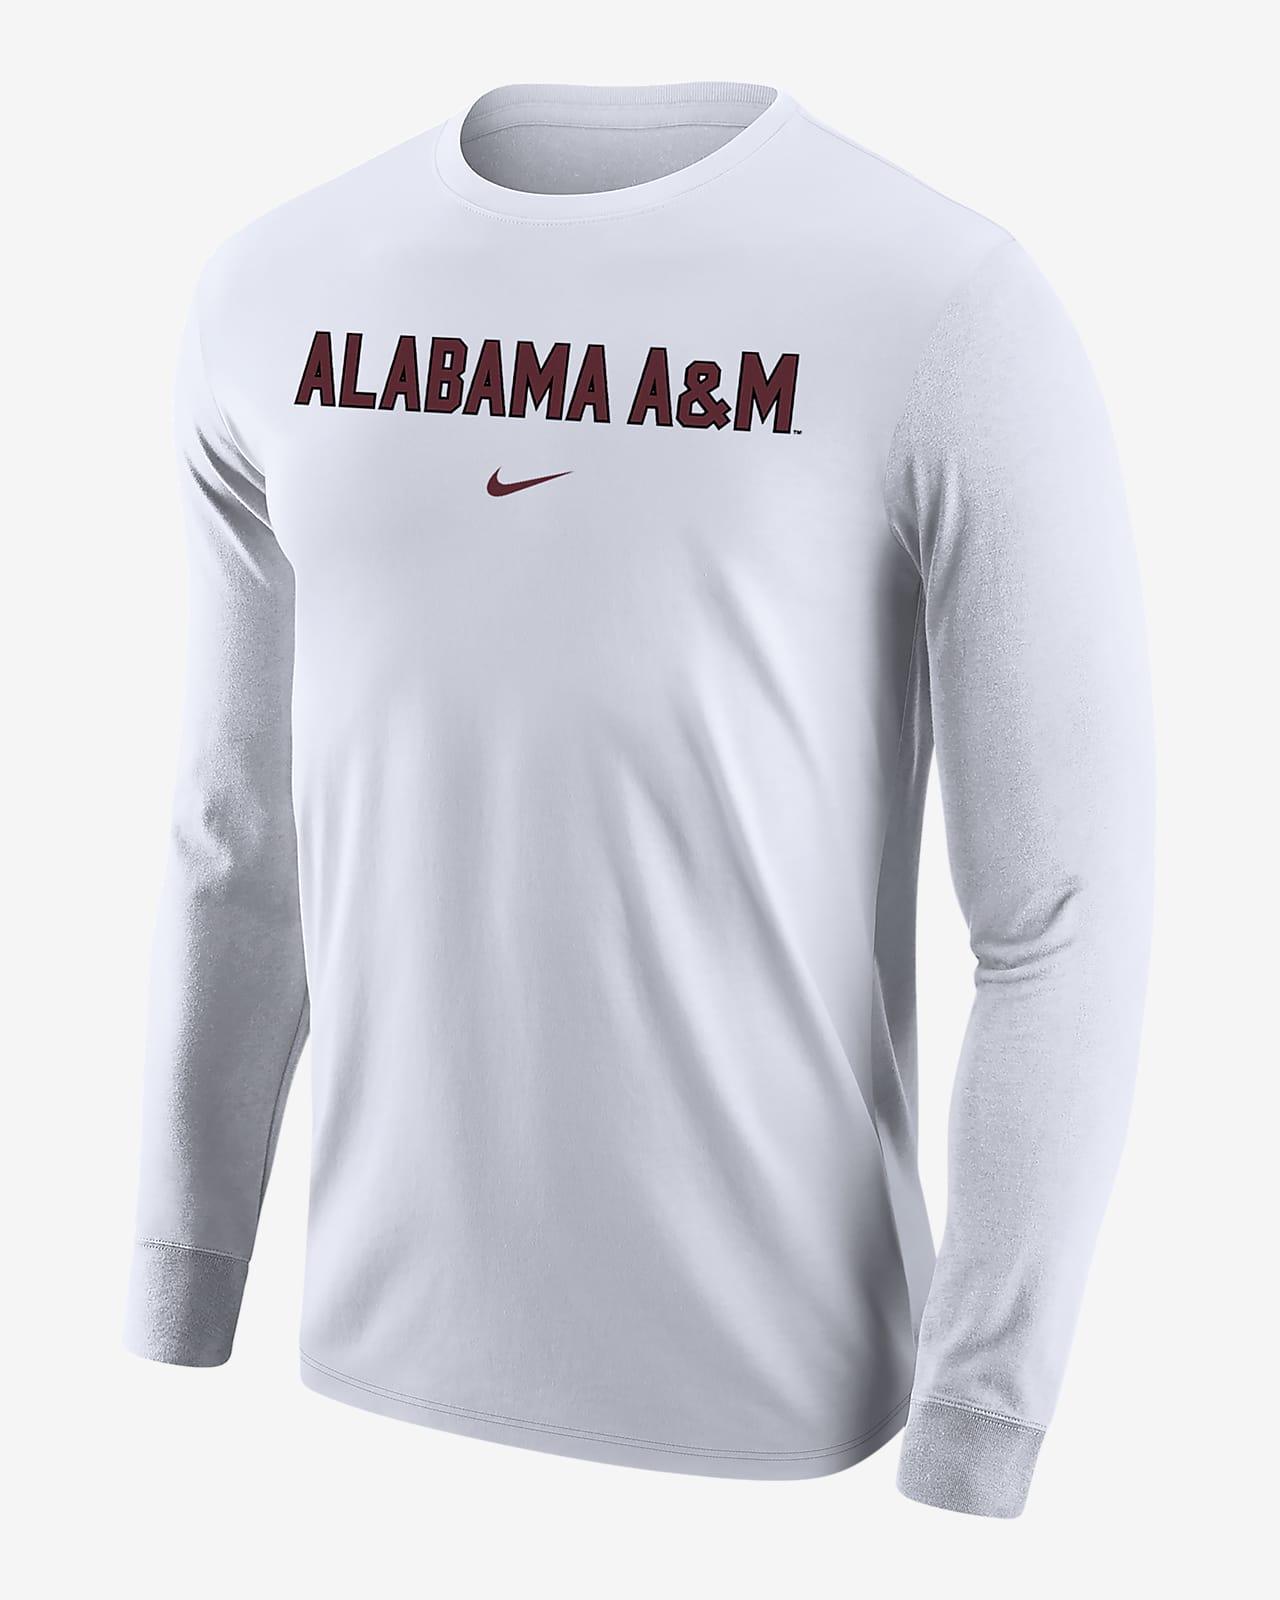 Nike College (Alabama A&M) Men's Long-Sleeve T-Shirt